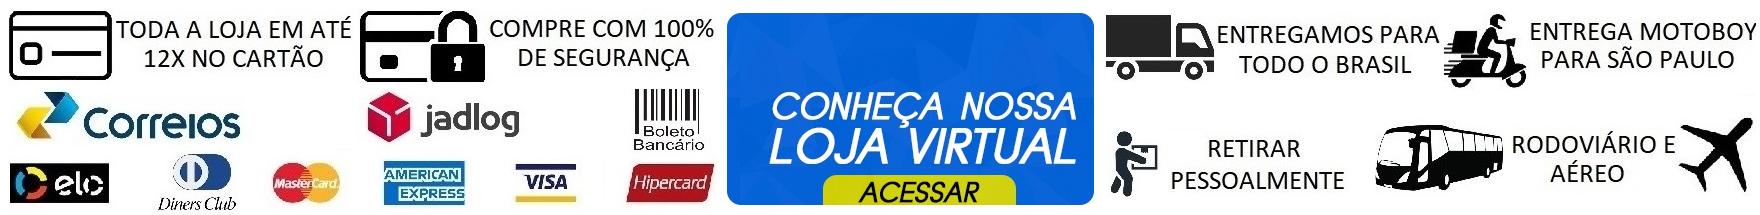 Banner Loja Online